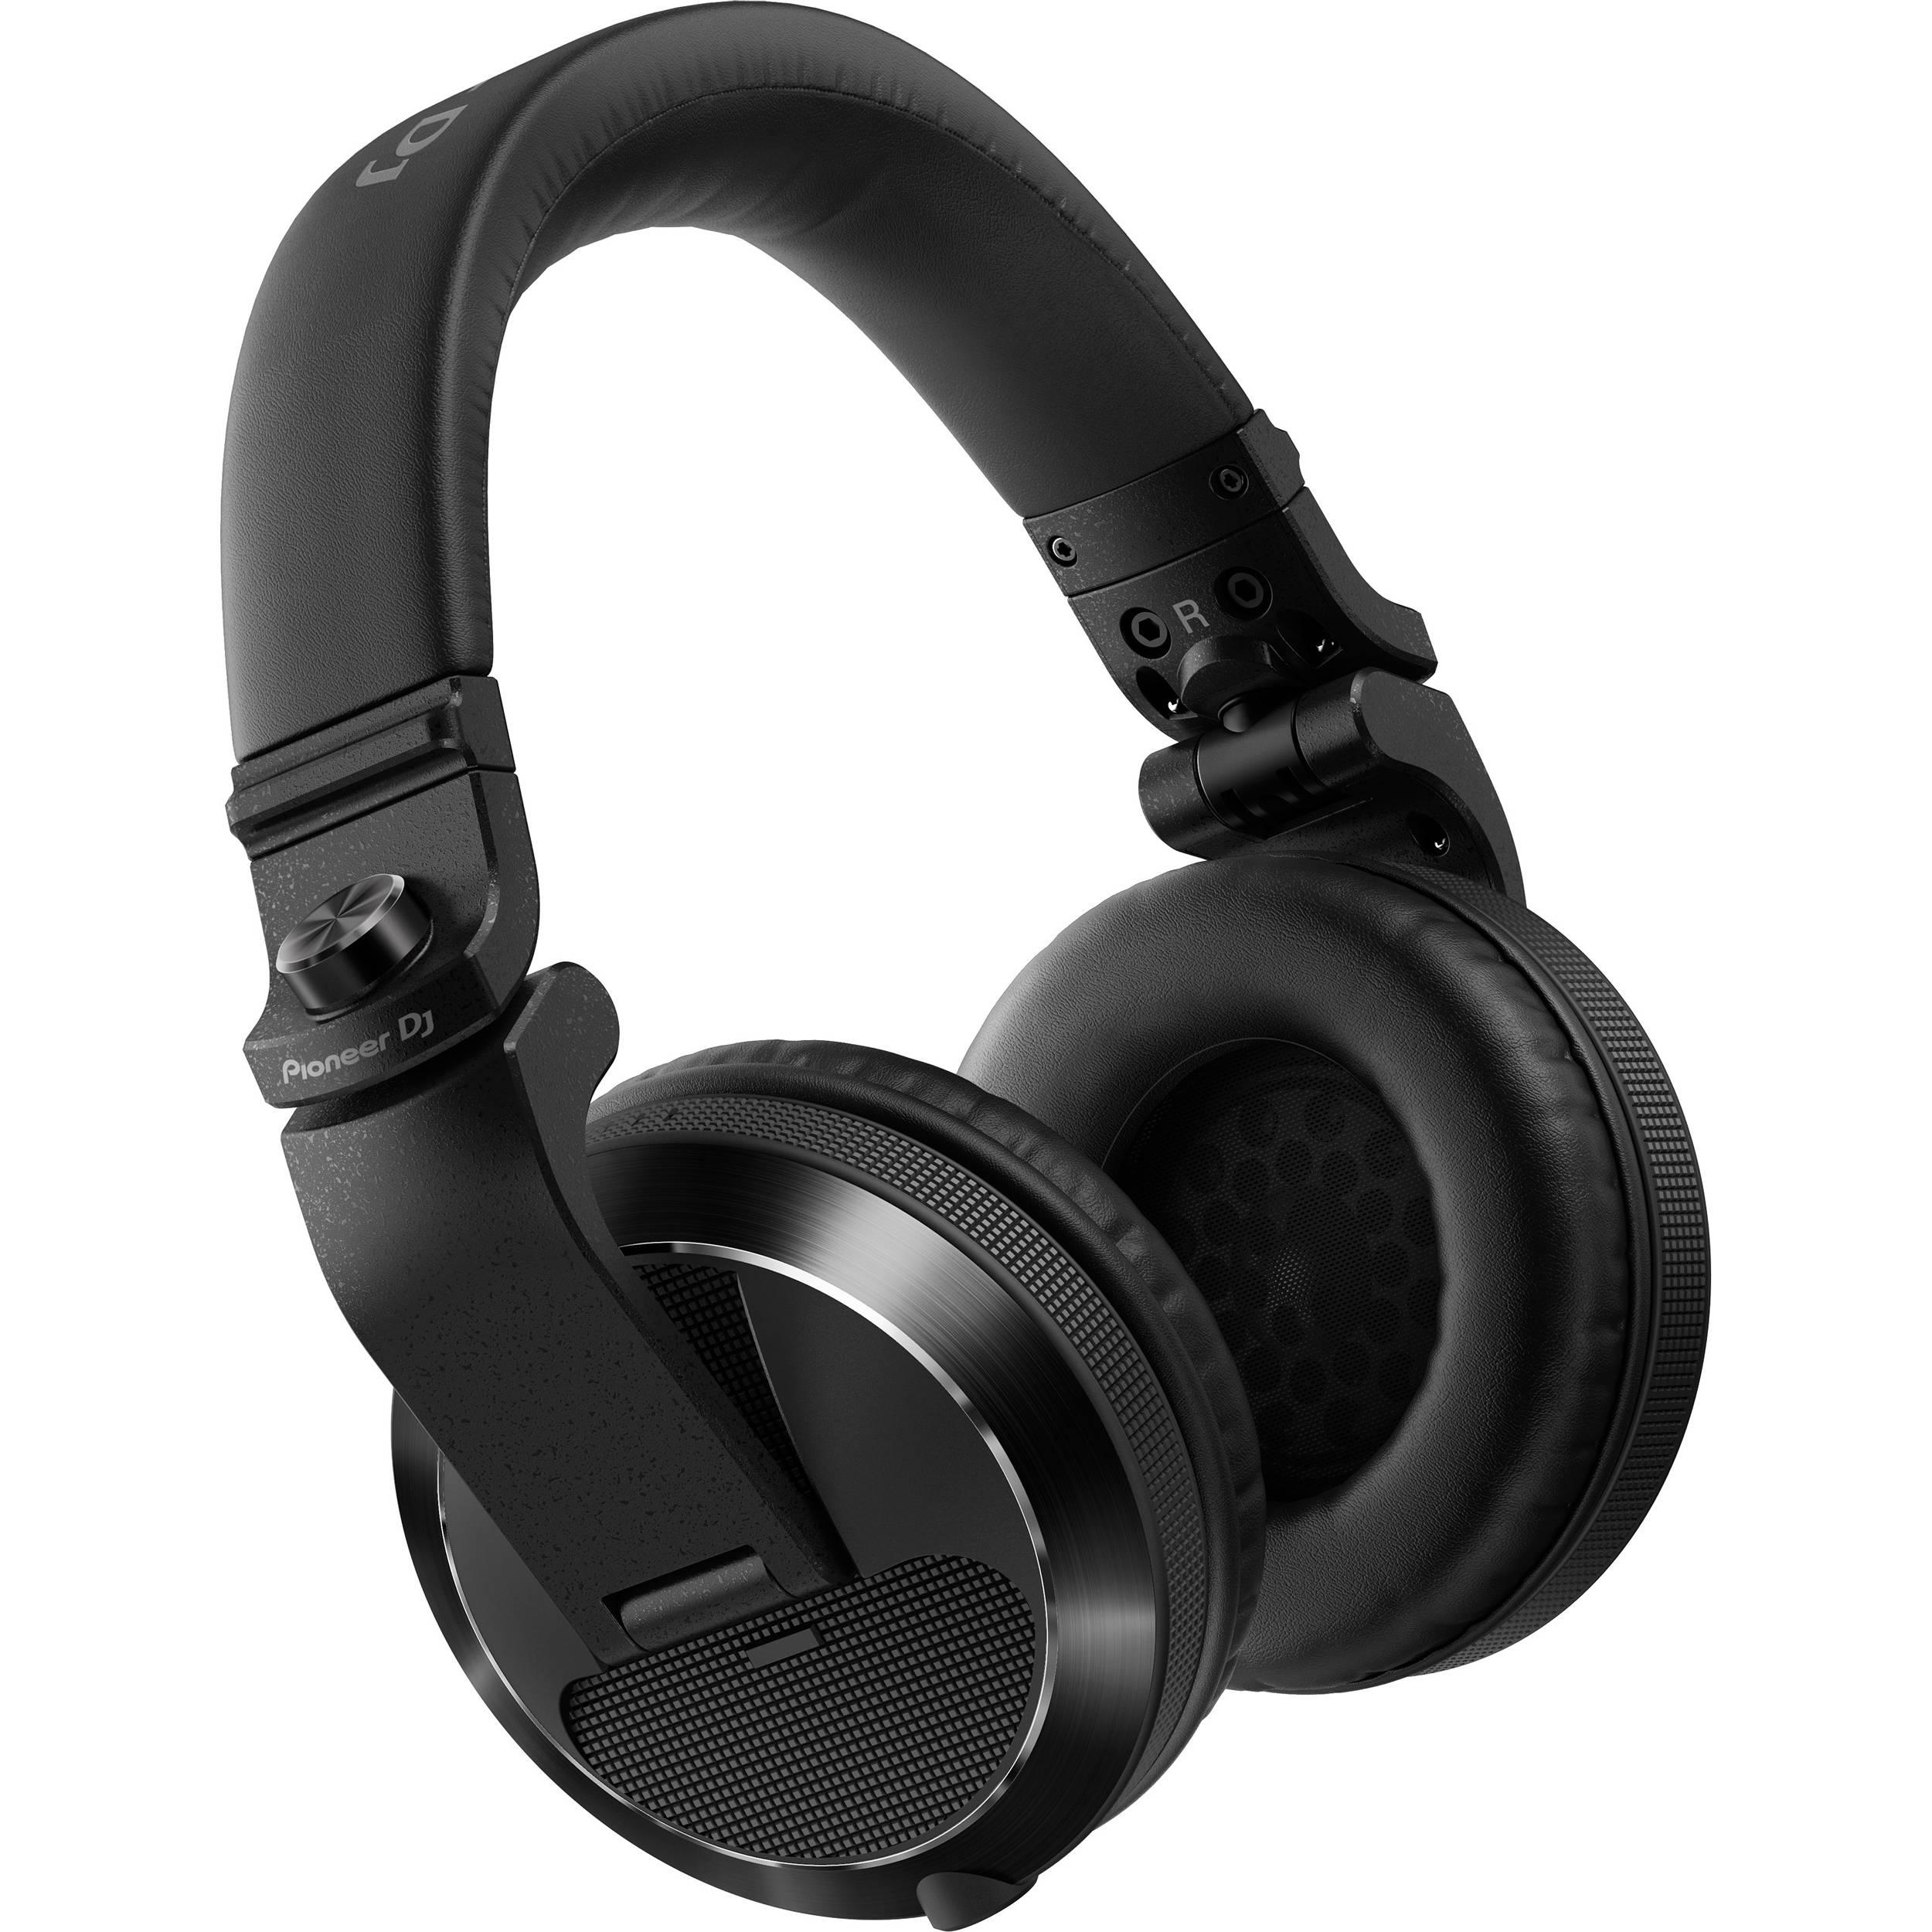 pioneer dj hdj x7 professional over ear dj headphones hdj x7 k. Black Bedroom Furniture Sets. Home Design Ideas